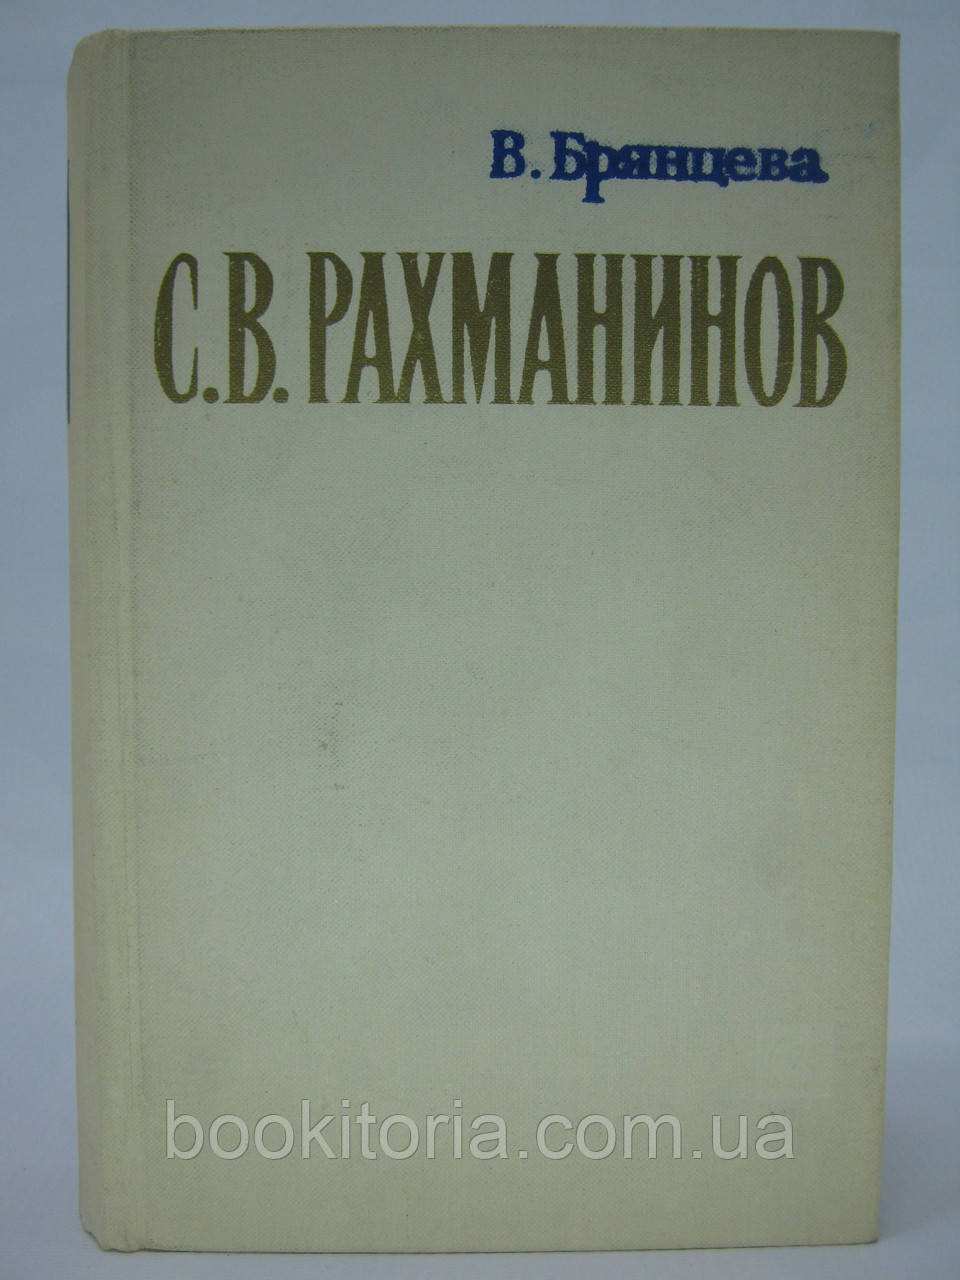 Брянцева В. С.В. Рахманинов (б/у).